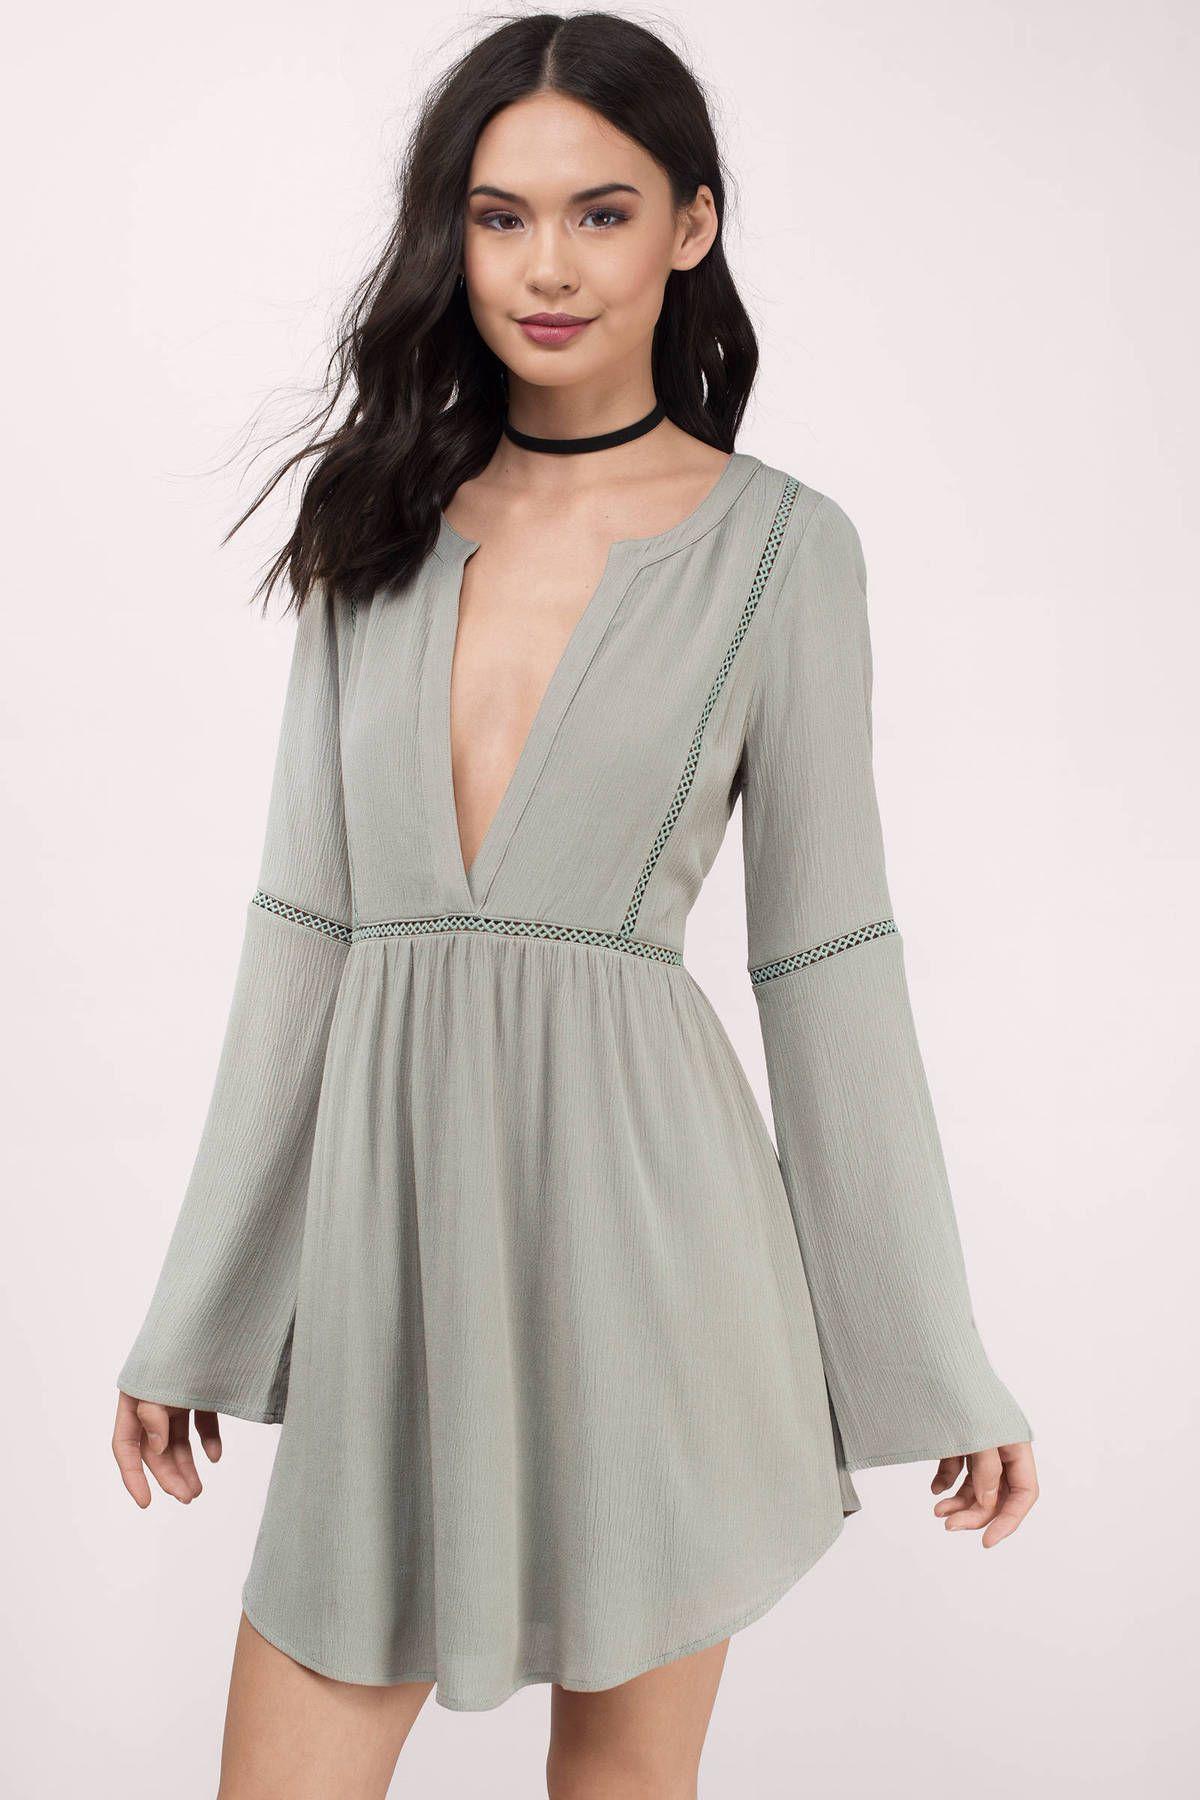 Tobi Trina Plunging Shift Dress Summer Dress Outfits Long Sleeve Plunge Dress Green Long Sleeve Dress [ 1800 x 1200 Pixel ]